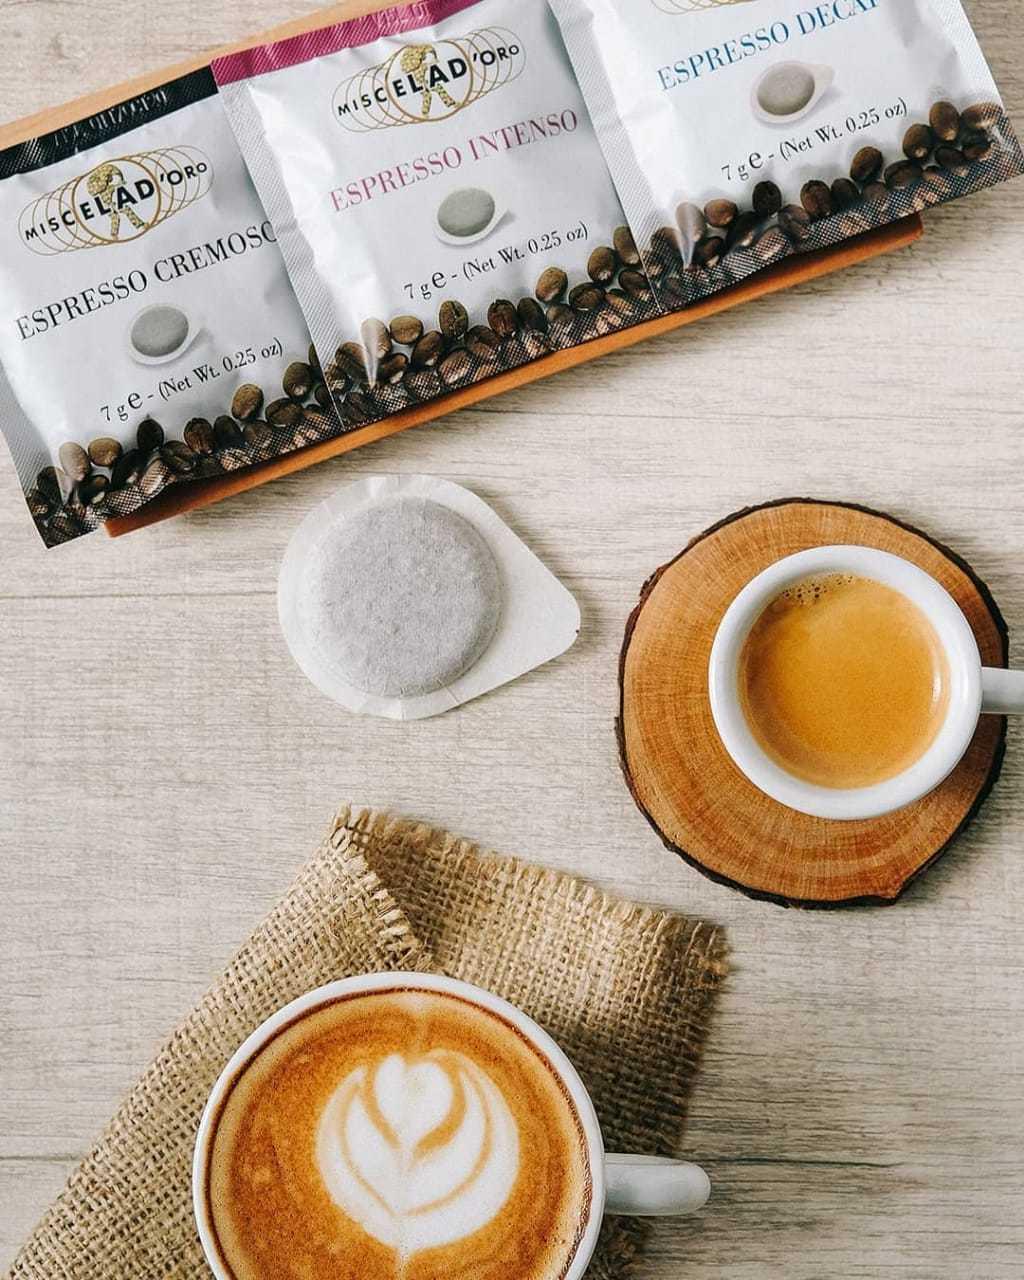 misceladoro espresso bean Indonesia